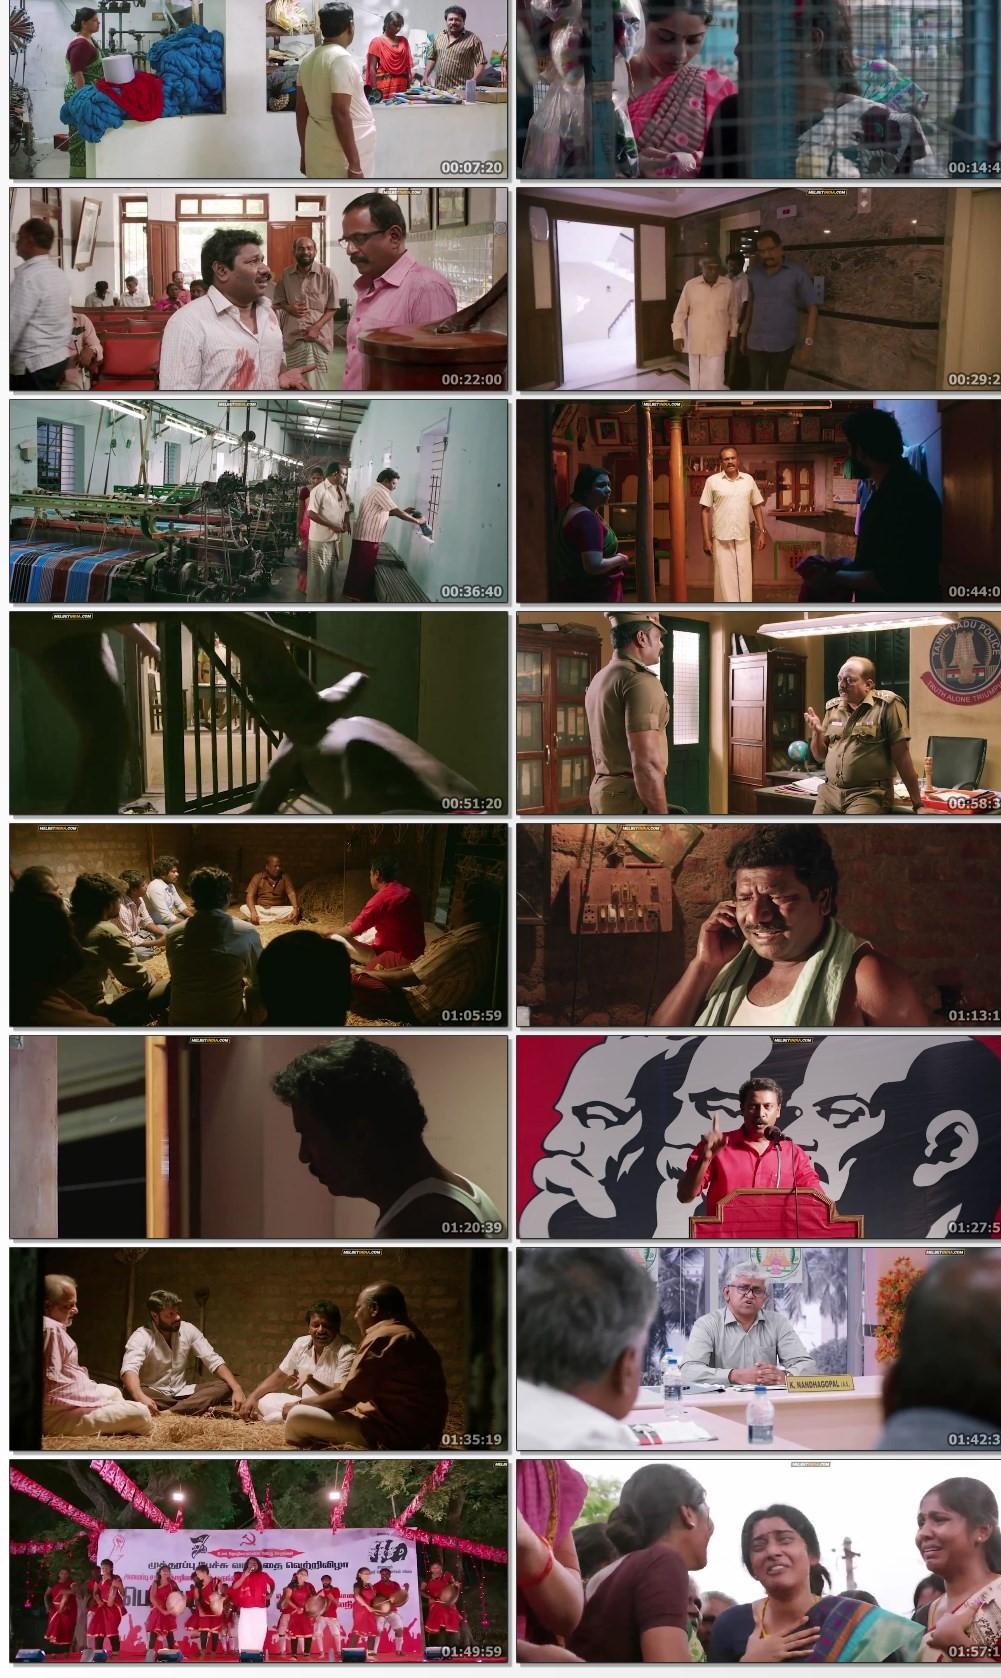 Sangathalaivan-2021-www-9kmovies-work-HQ-Hindi-Dubbed-720p-HDRip-850-MB-mkv-thumbs0aca856a937f71f5